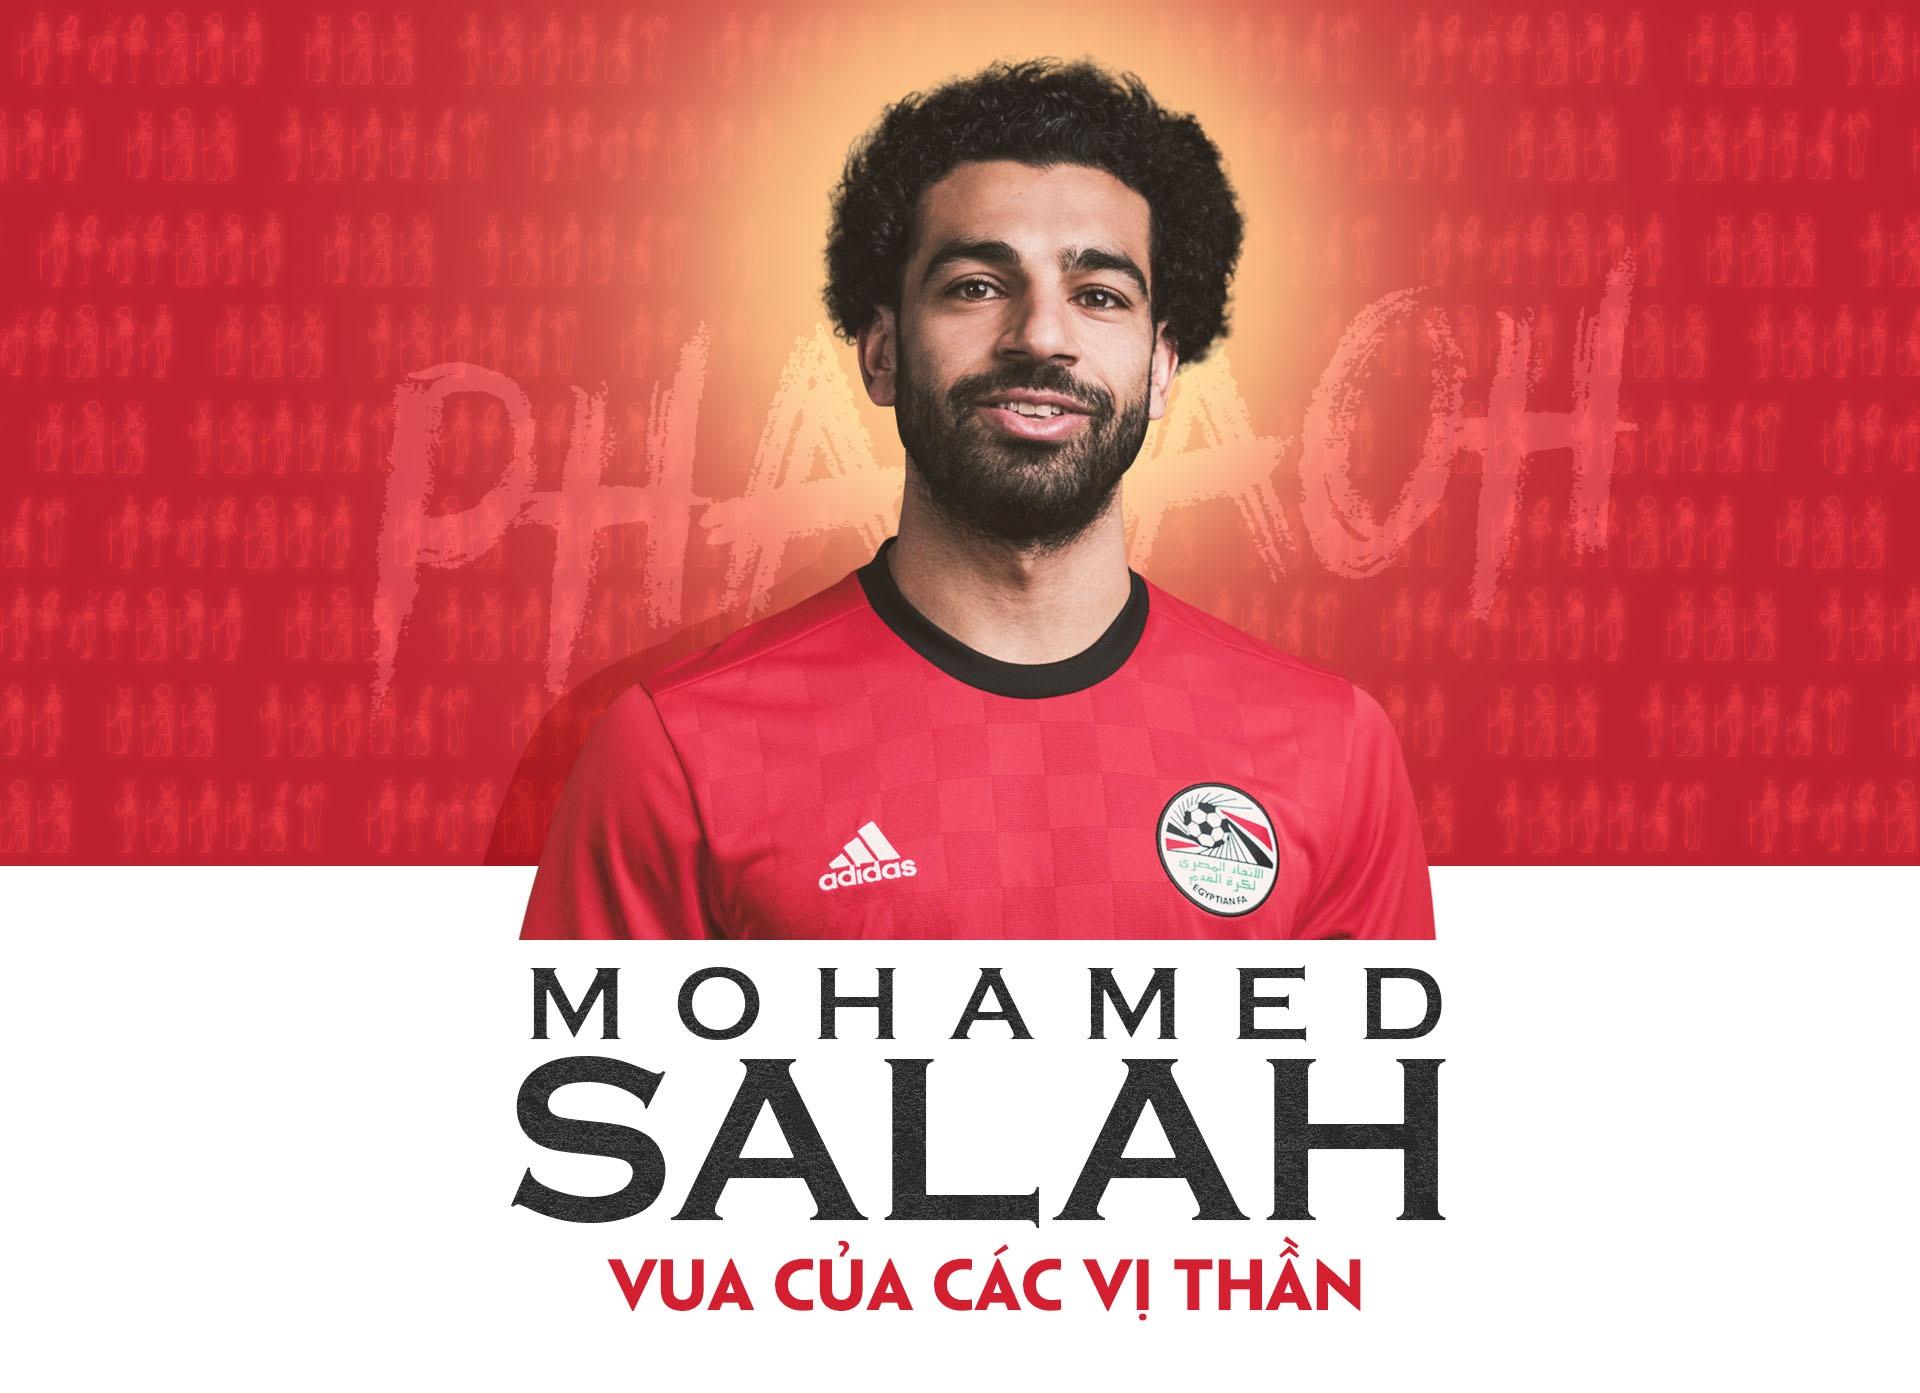 Mohamed Salah - Vua cua cac vi than hinh anh 2